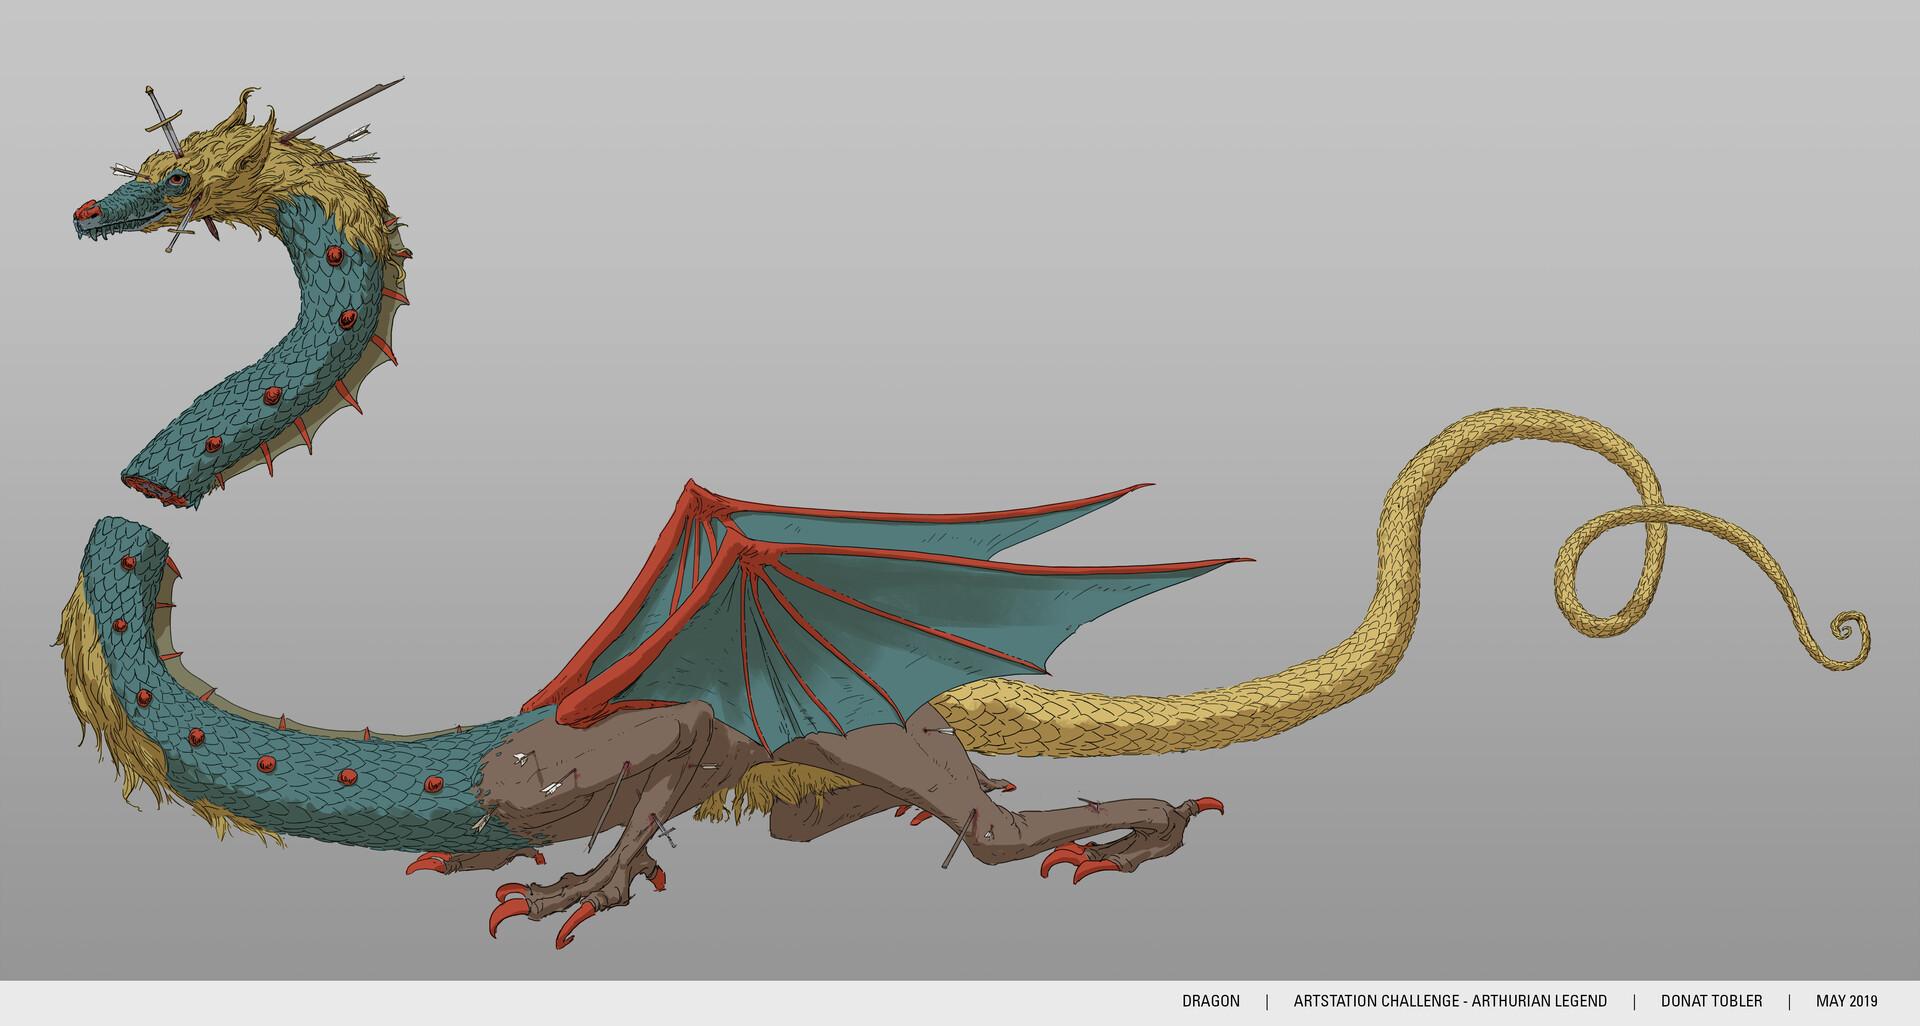 Donat tobler donattobler arthurchallenge dragon 75pc